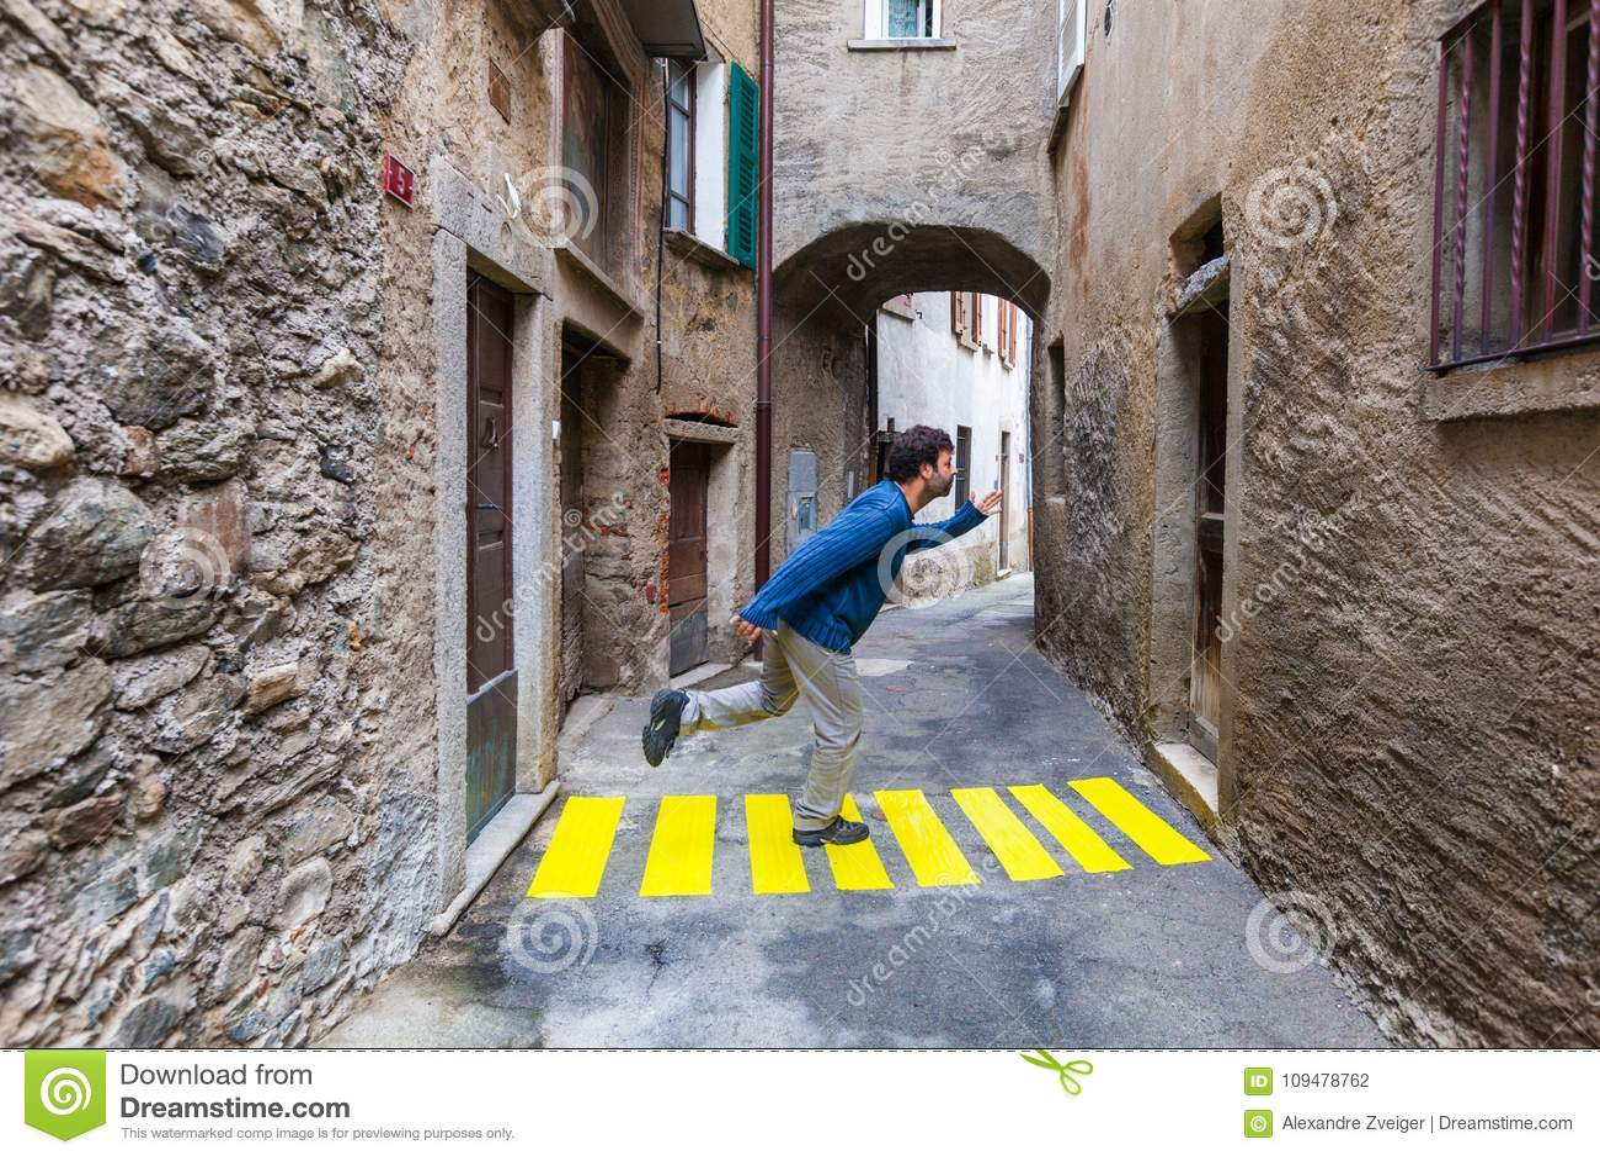 Comic scene. Concept, crosswalks in the alley